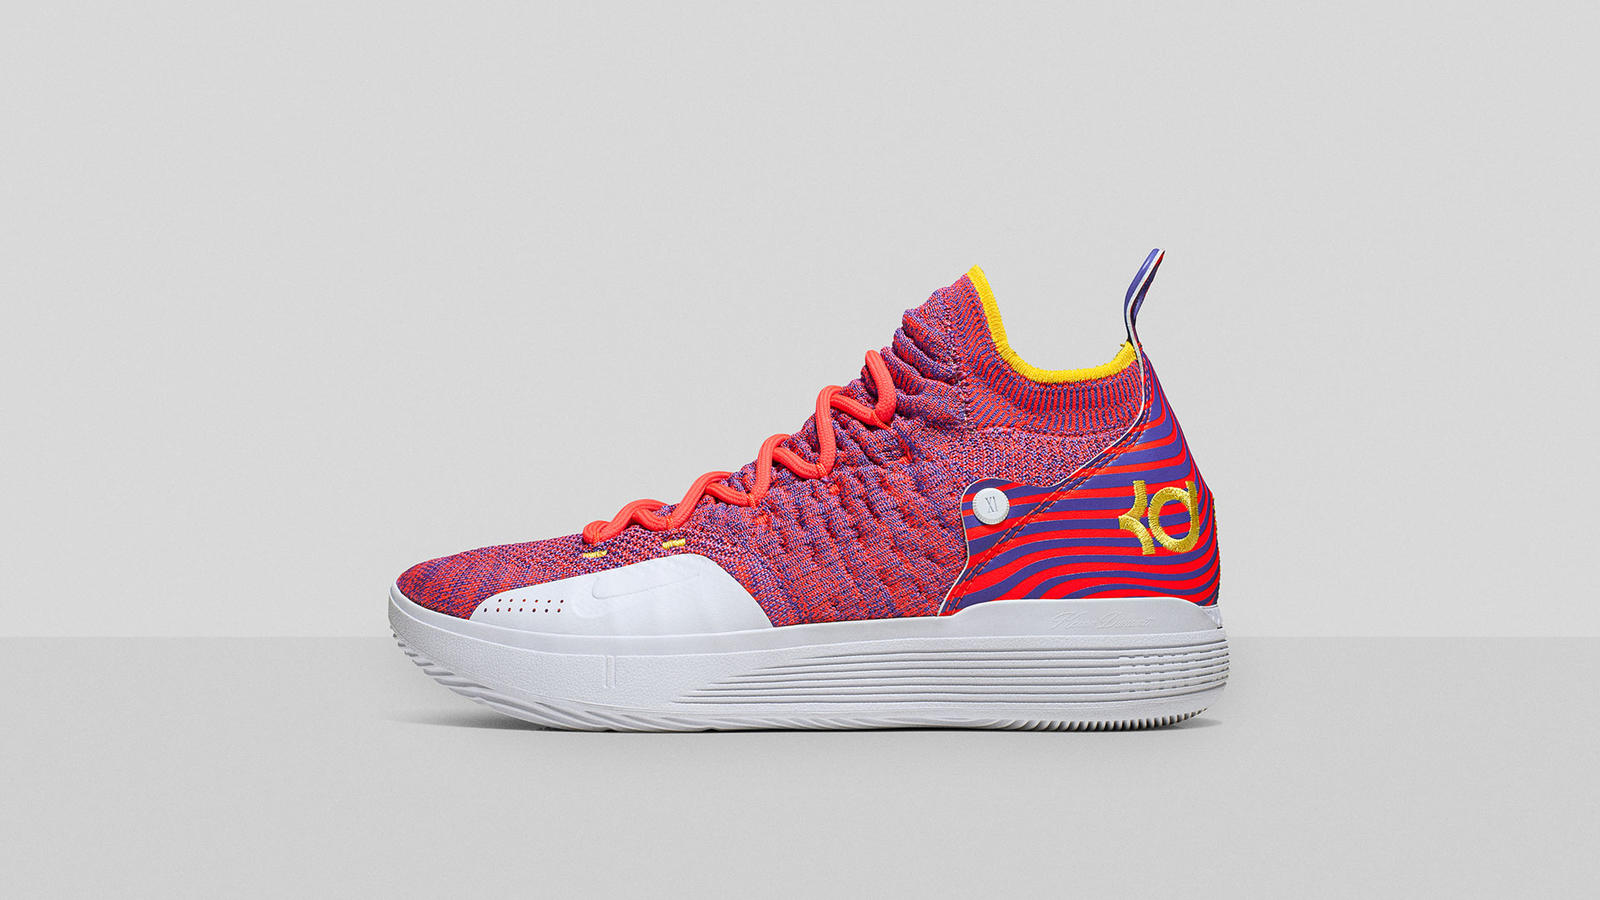 KD 11 2018 WNBA All-Star Game PE Collection